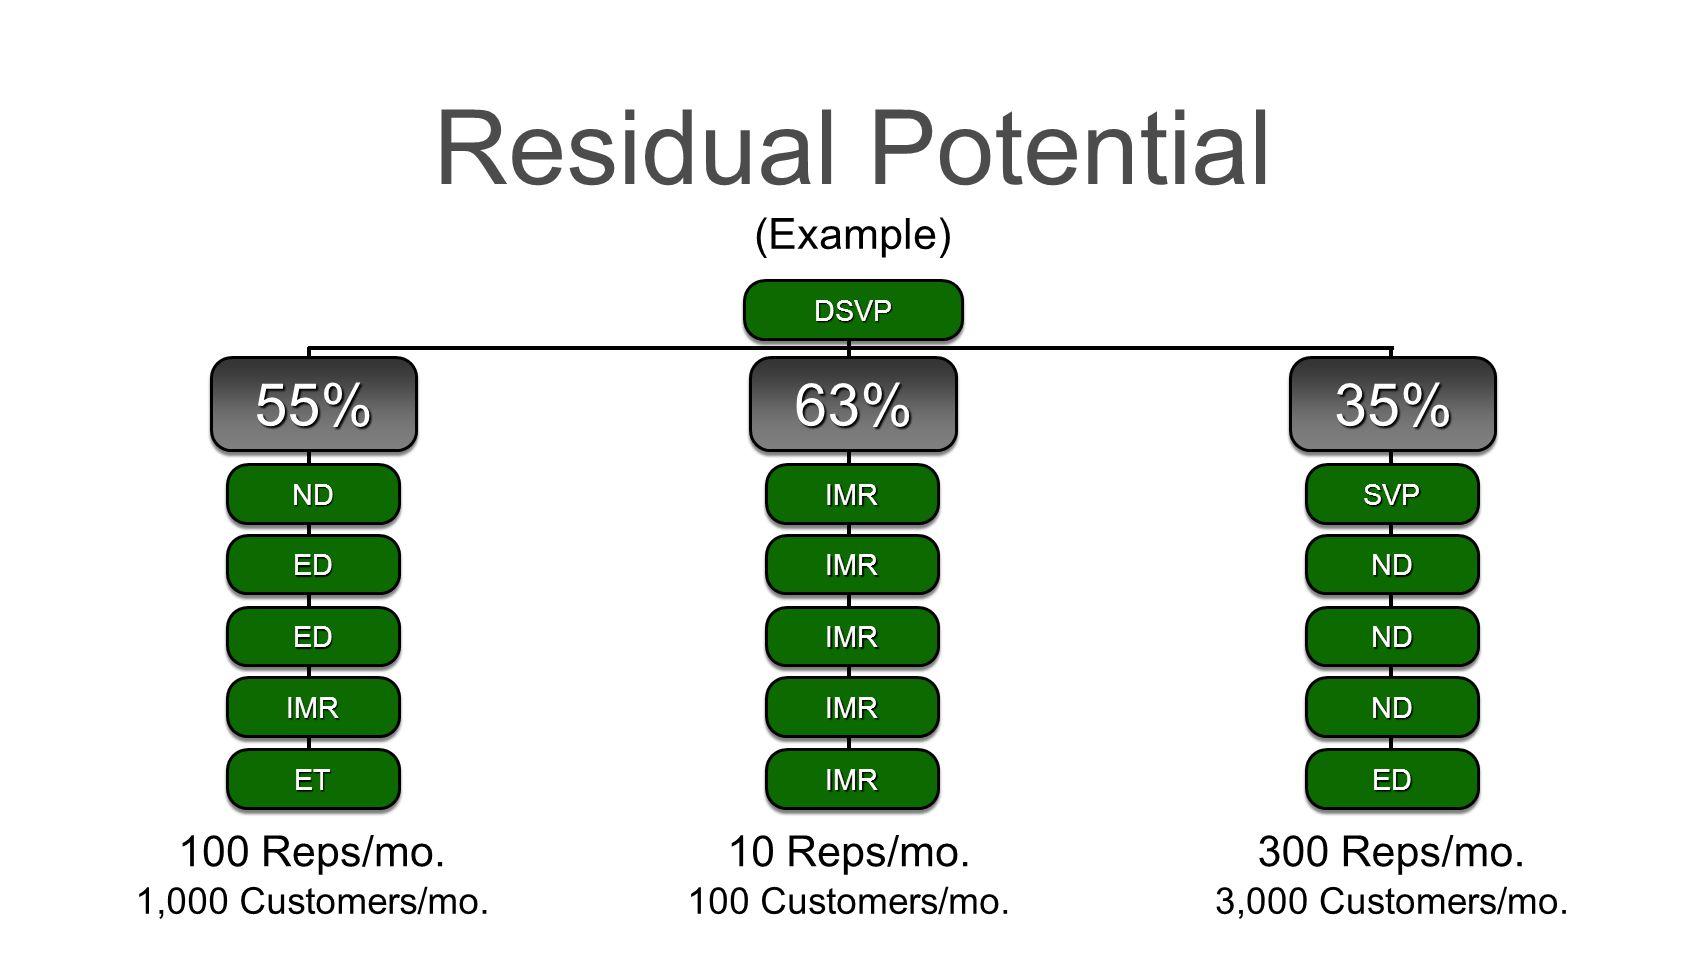 Residual Potential DSVPDSVP IMRIMR 63%63%55%55%35%35% IMRIMR IMRIMR IMRIMR IMRIMR NDND EDED EDED IMRIMR ETET SVPSVP NDND NDND NDND EDED (Example) 100 Reps/mo.